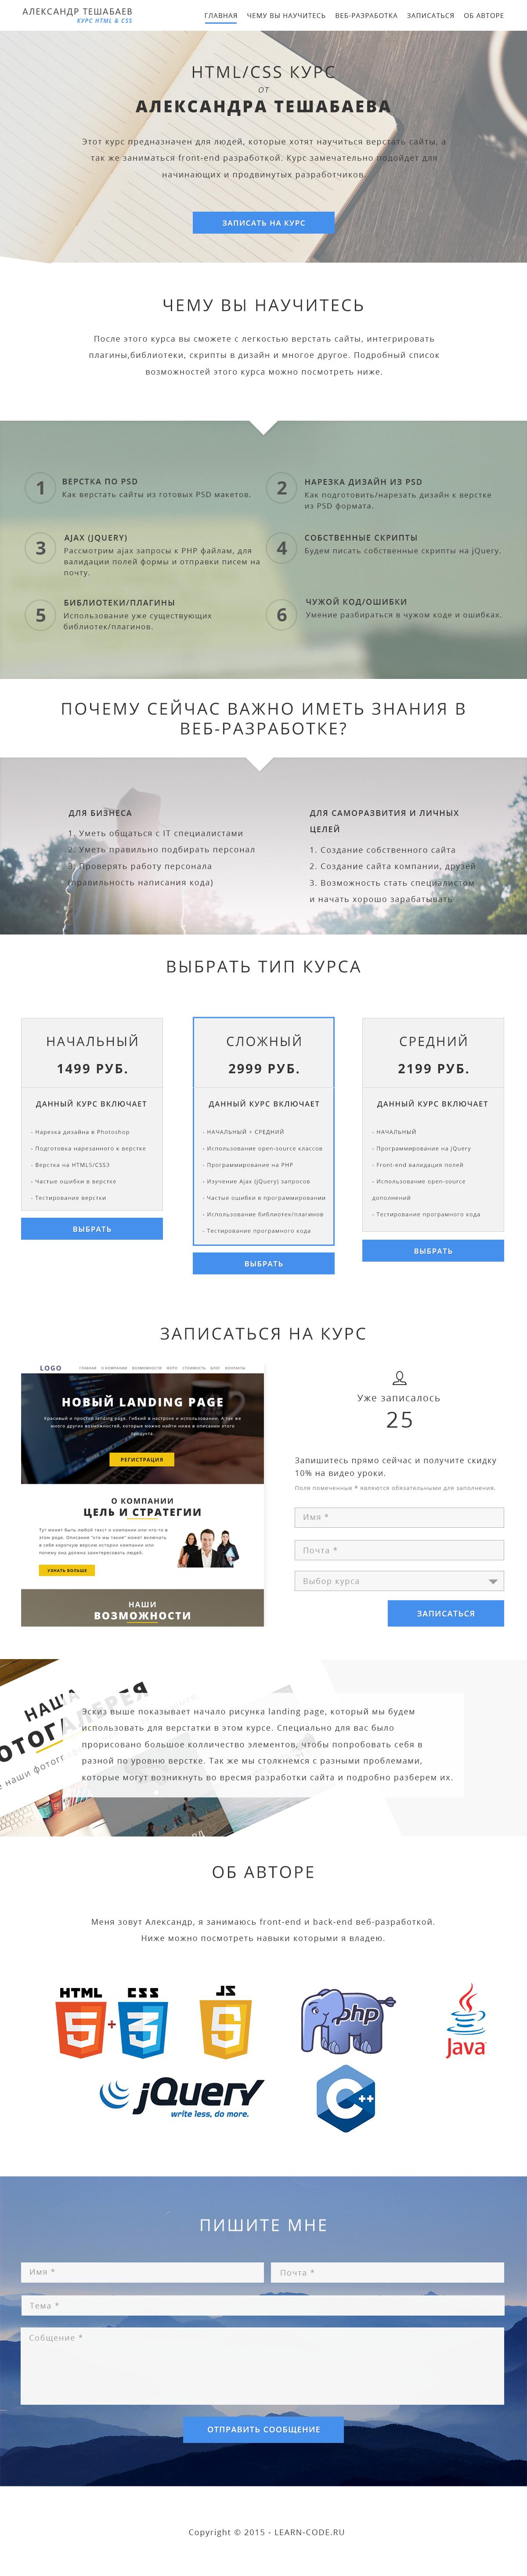 Проект Learn-Code.ru